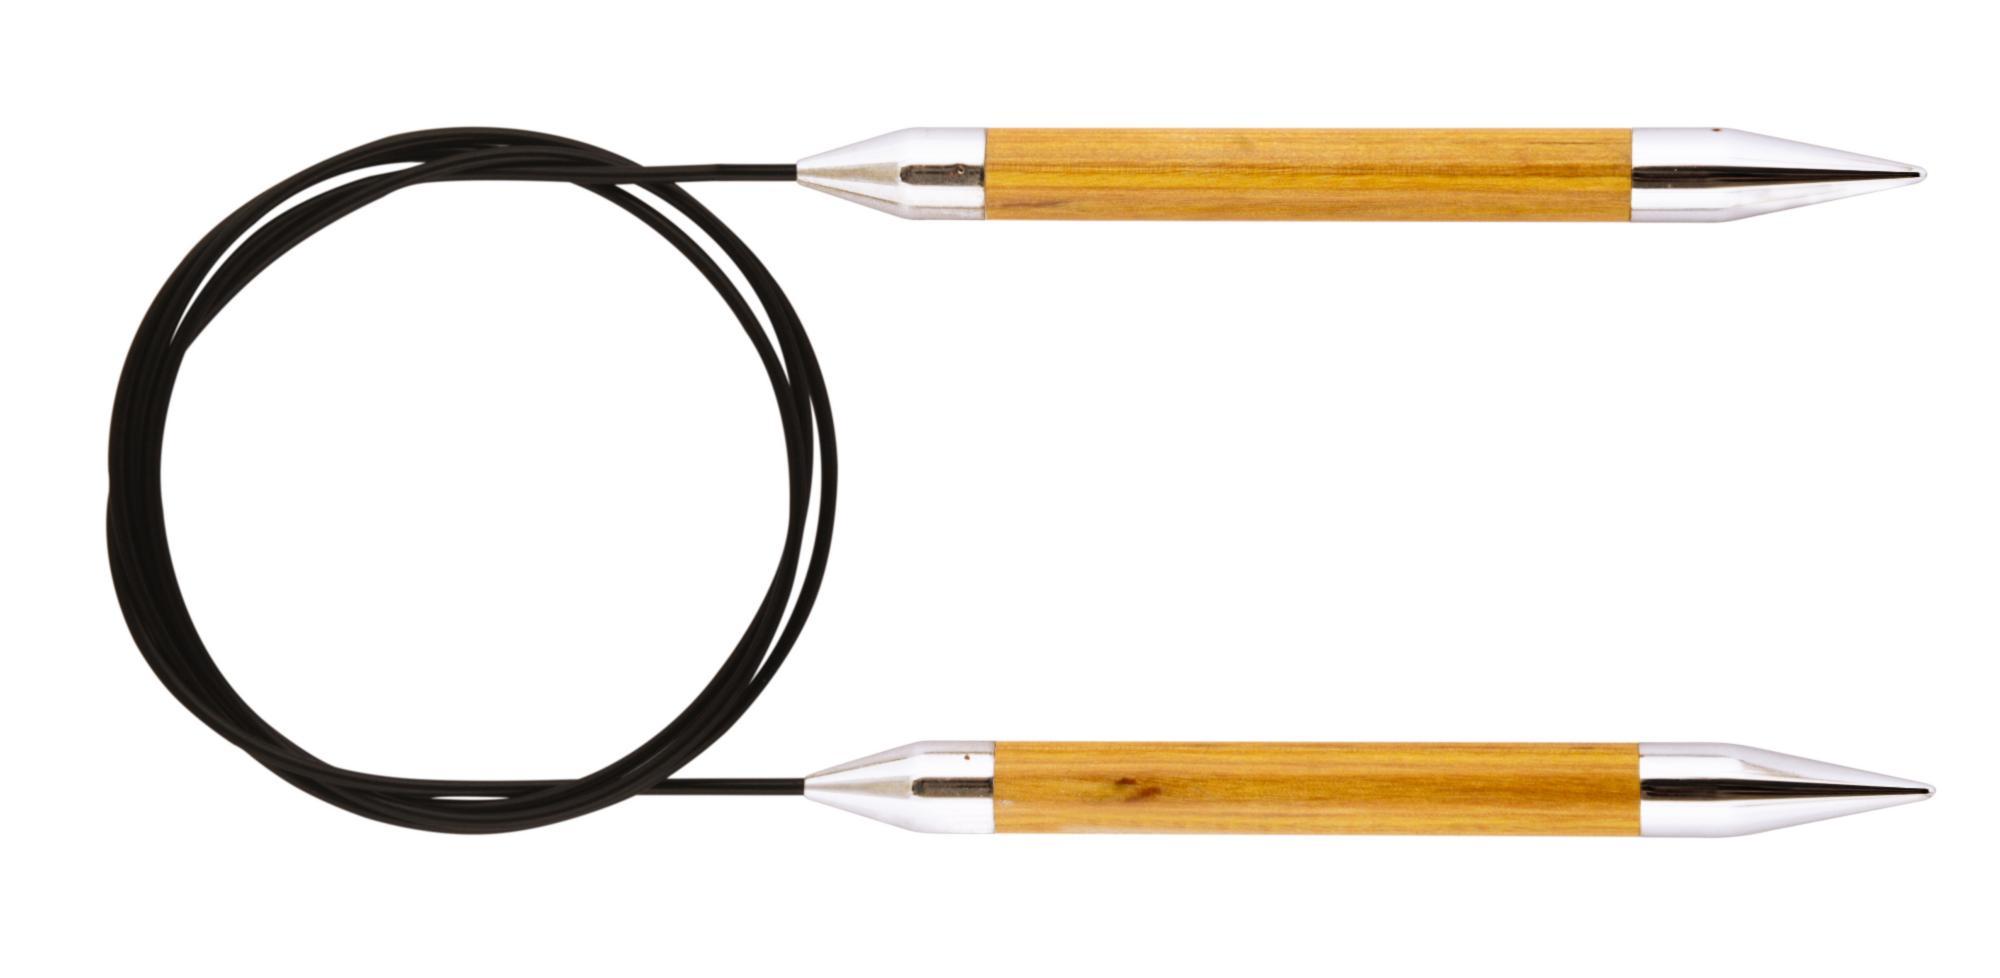 Спицы круговые 150 см Royale KnitPro, 29165, 12.00 мм